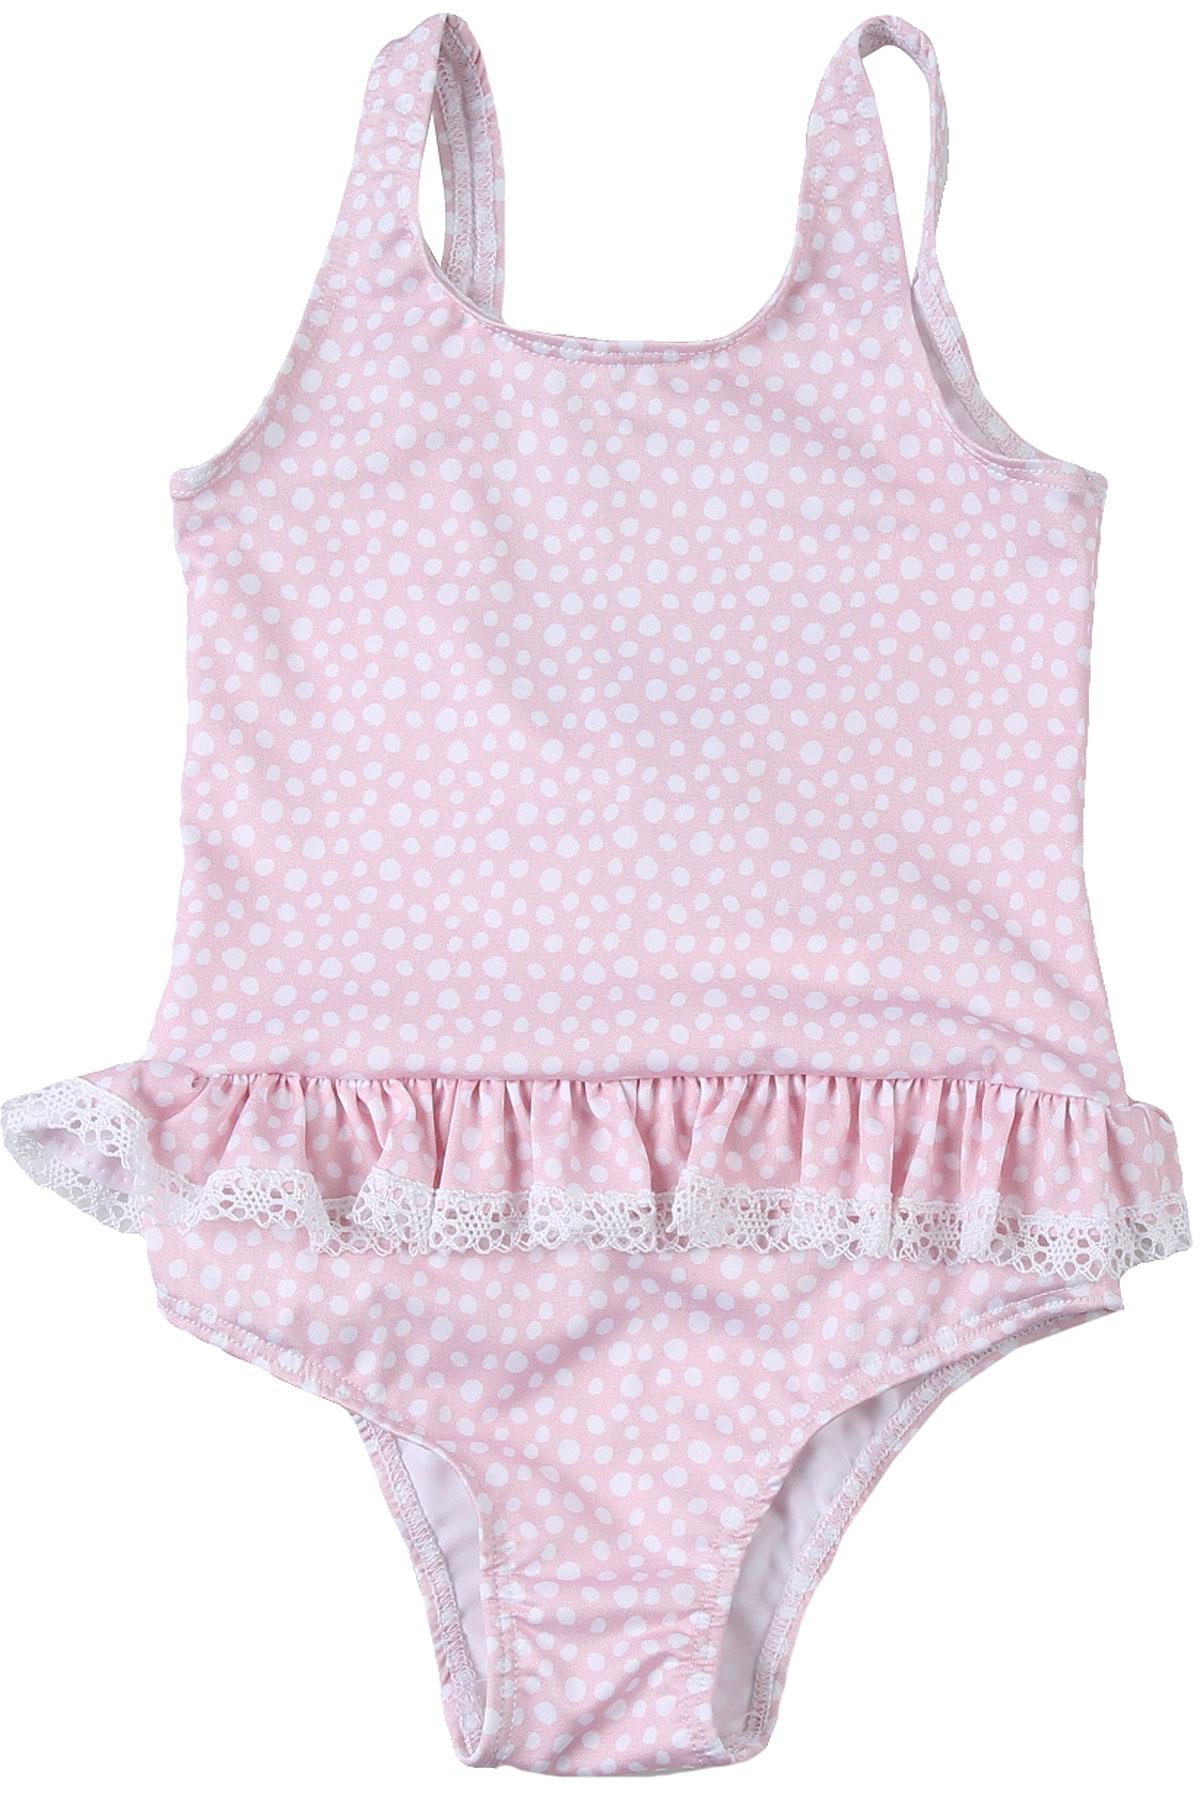 Paz Rodriguez Swimwear On Sale, Pink, polyamide, 2019, 12M 18M 2Y 3Y